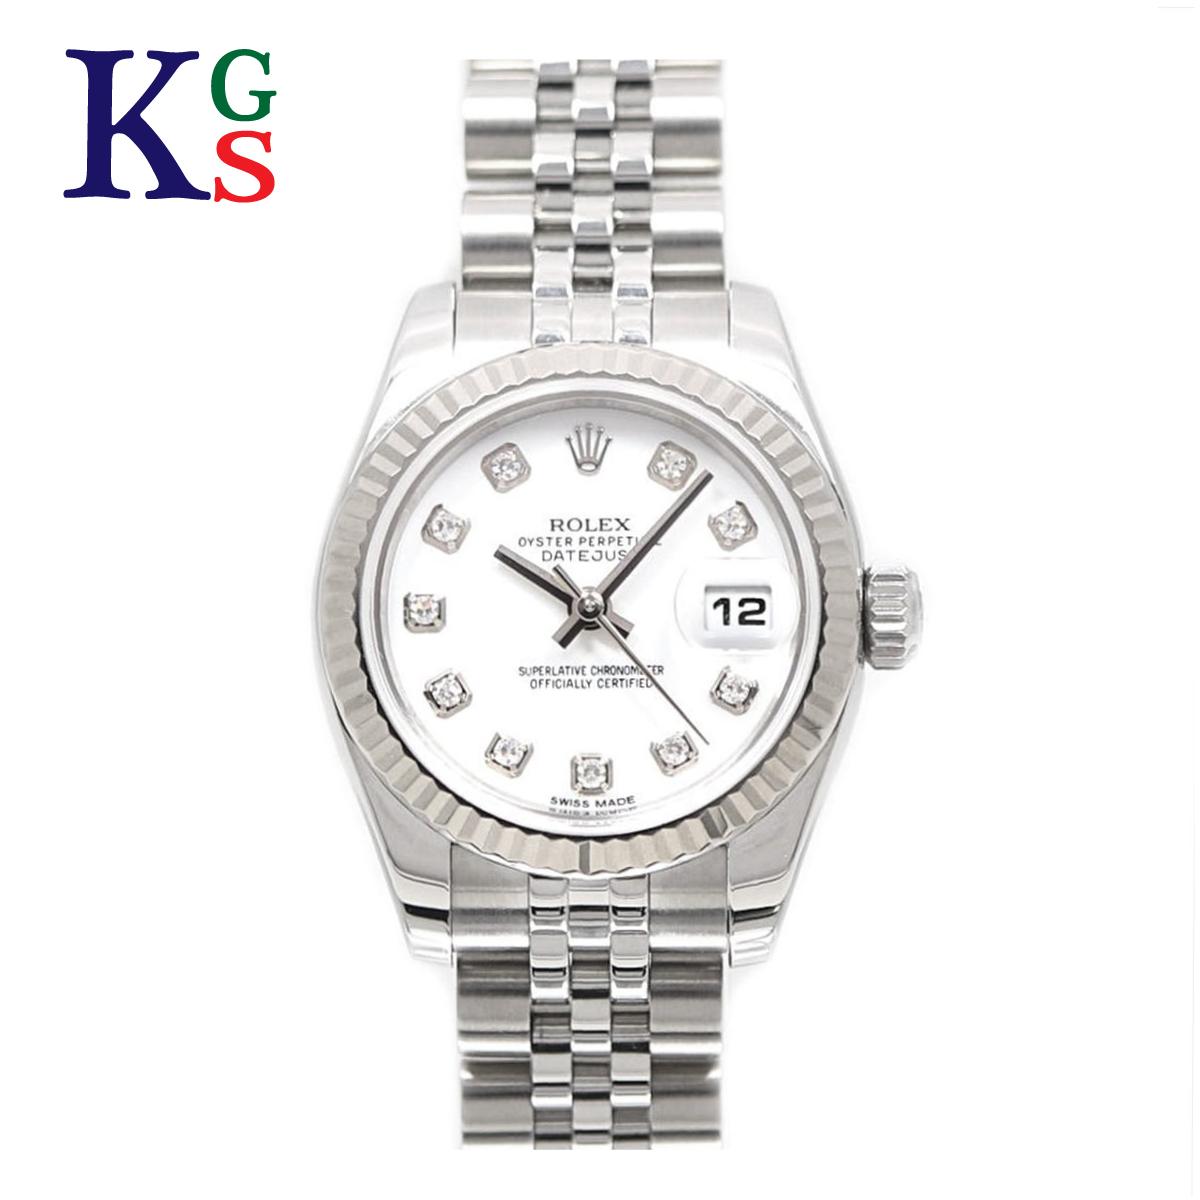 Rolex Rolex Lady S Watch Date Just 26mm 10p Diamond White Clockface K18wg X Stainless Steel Self Winding Watch 179174g